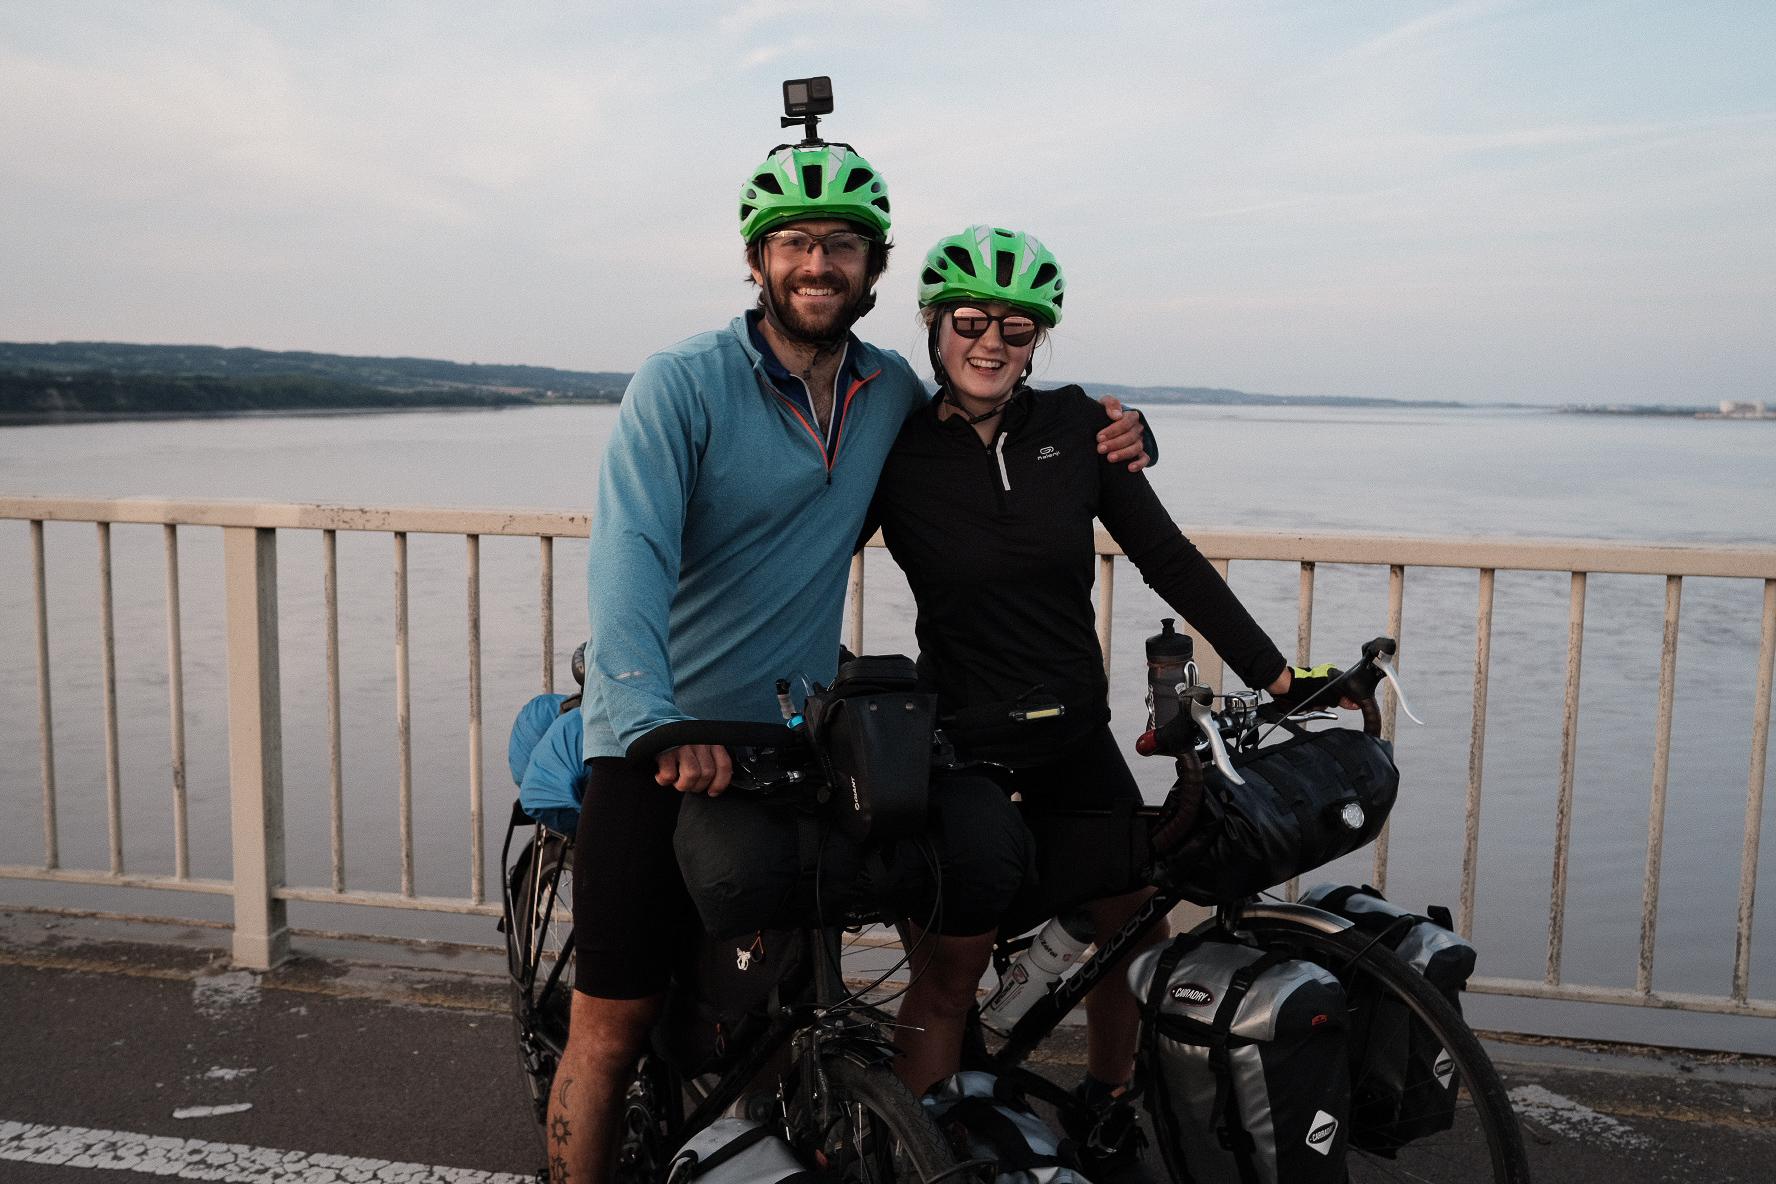 Cycling the Severn Bridge